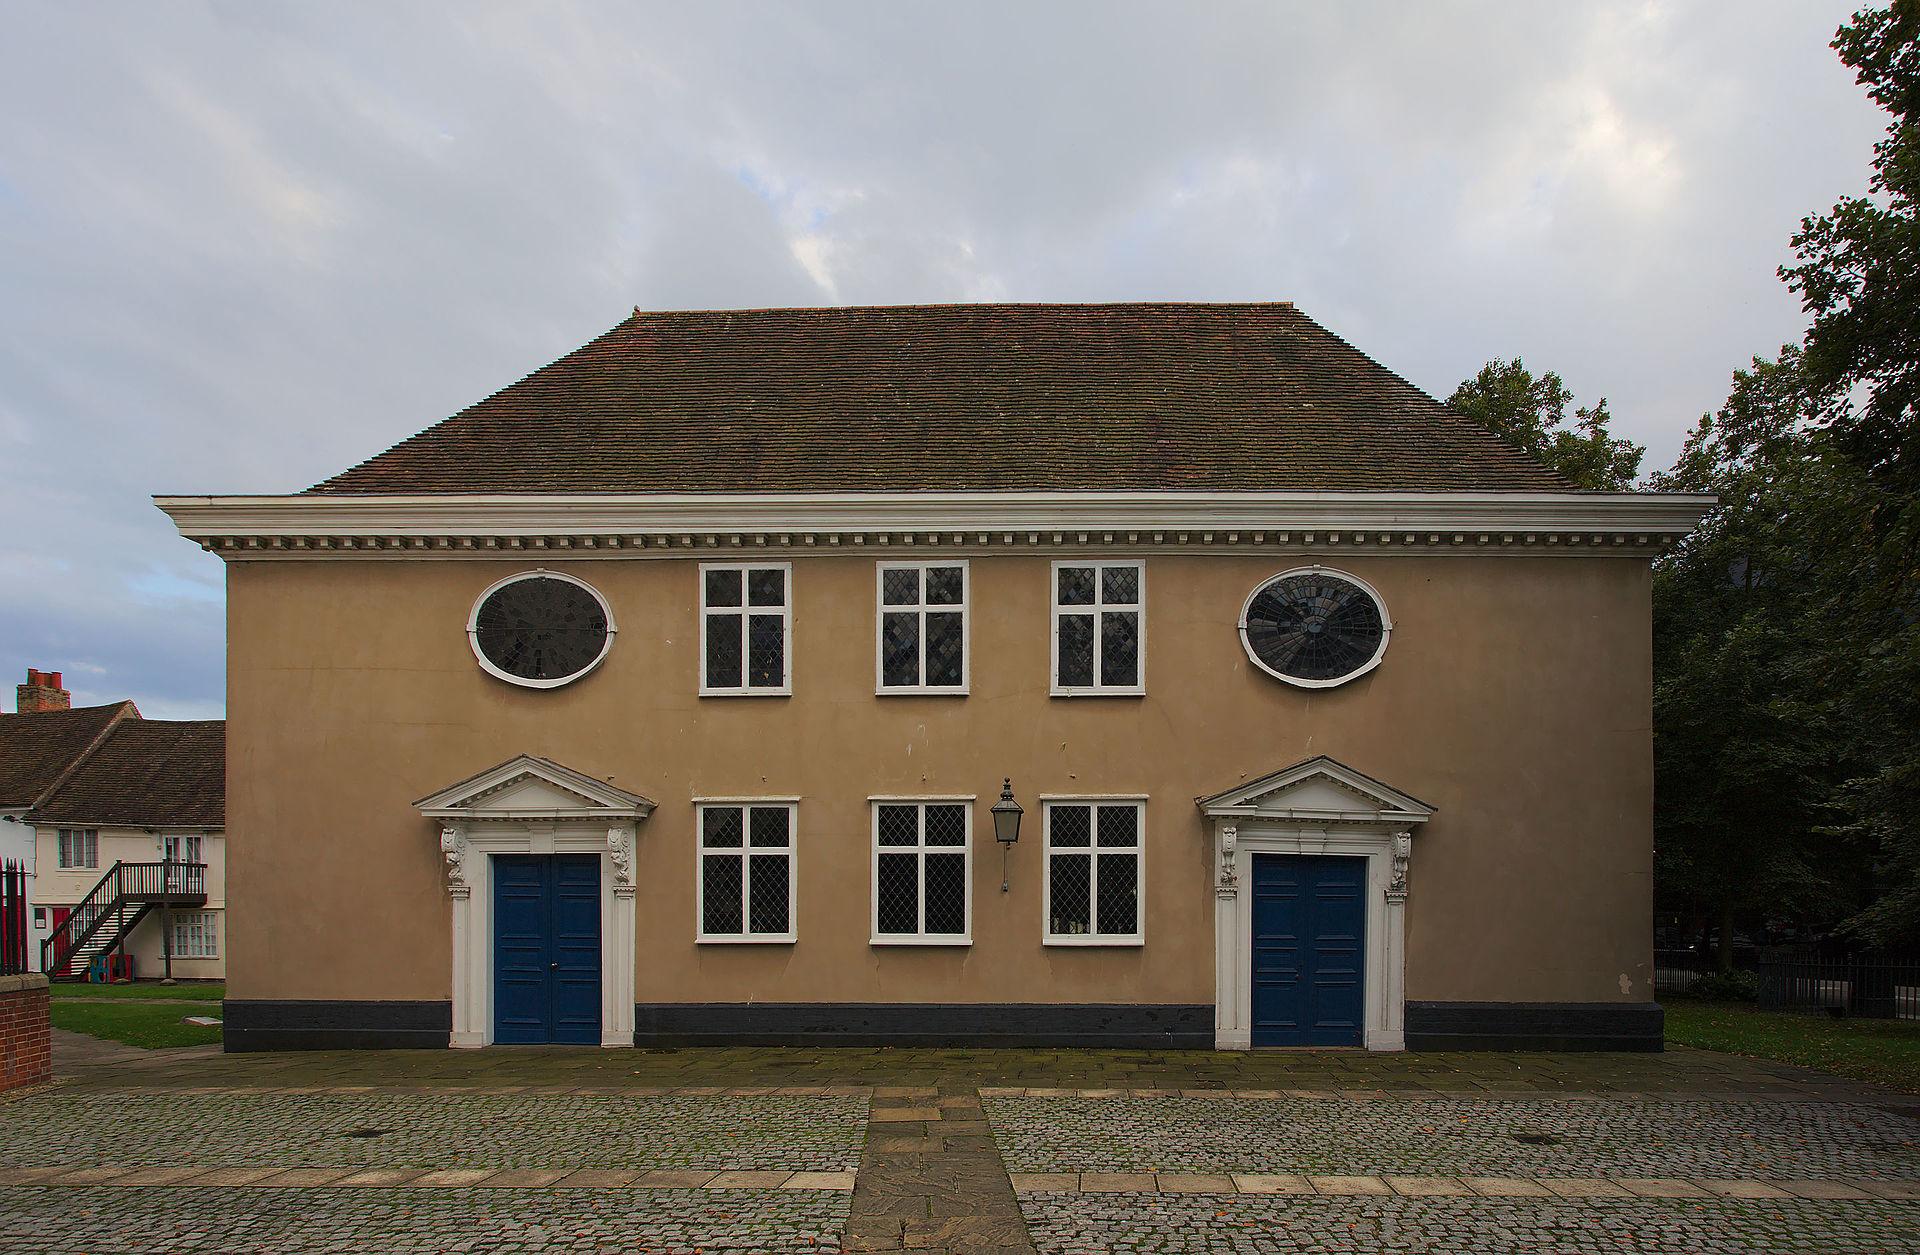 Ipswich Unitarian Meeting House